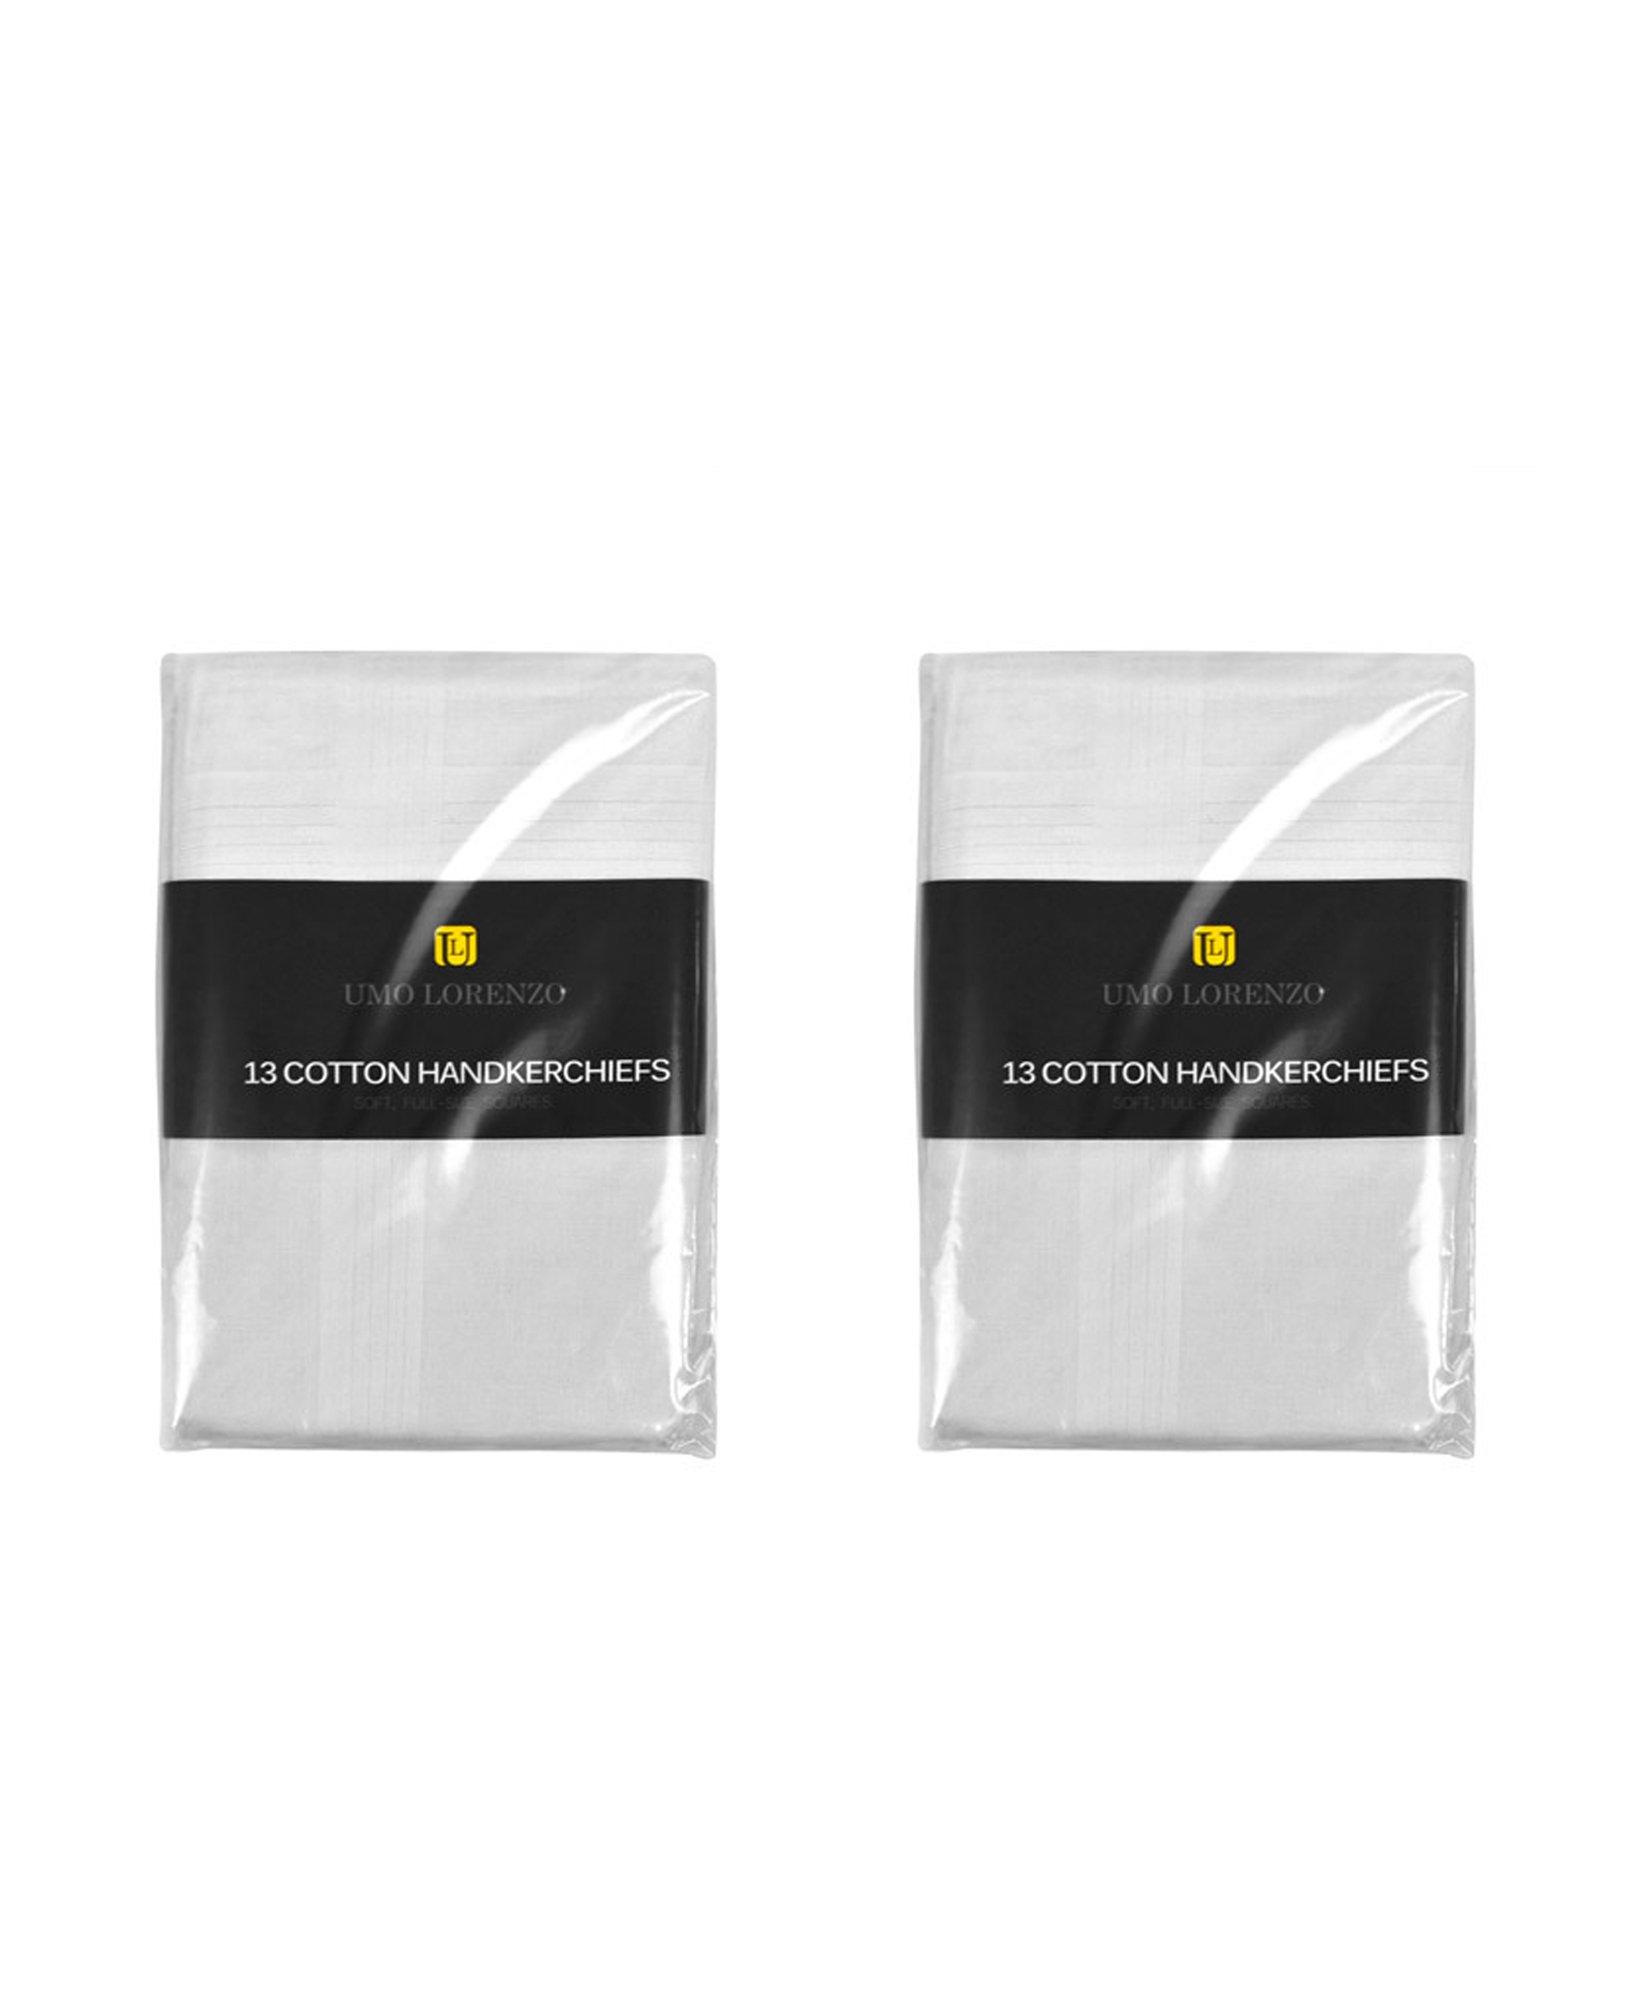 Men's Cotton Handkerchief Multi-Pack by Umo Lorenzo in White (One Size, H013-2pk)